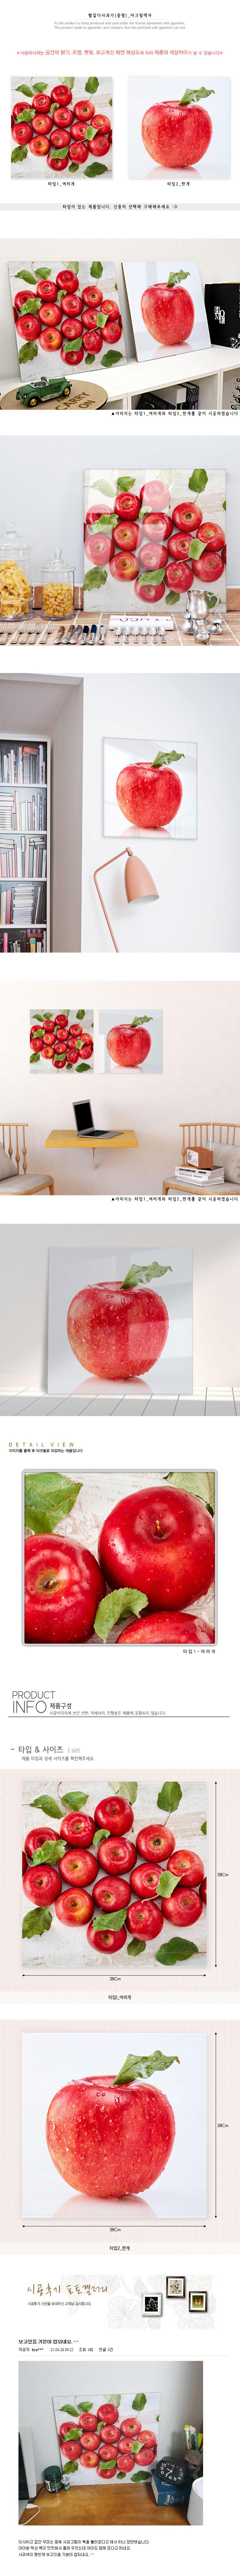 ih900-아크릴액자_빨갛다사과가(중형) - 꾸밈, 25,600원, 홈갤러리, 캔버스아트